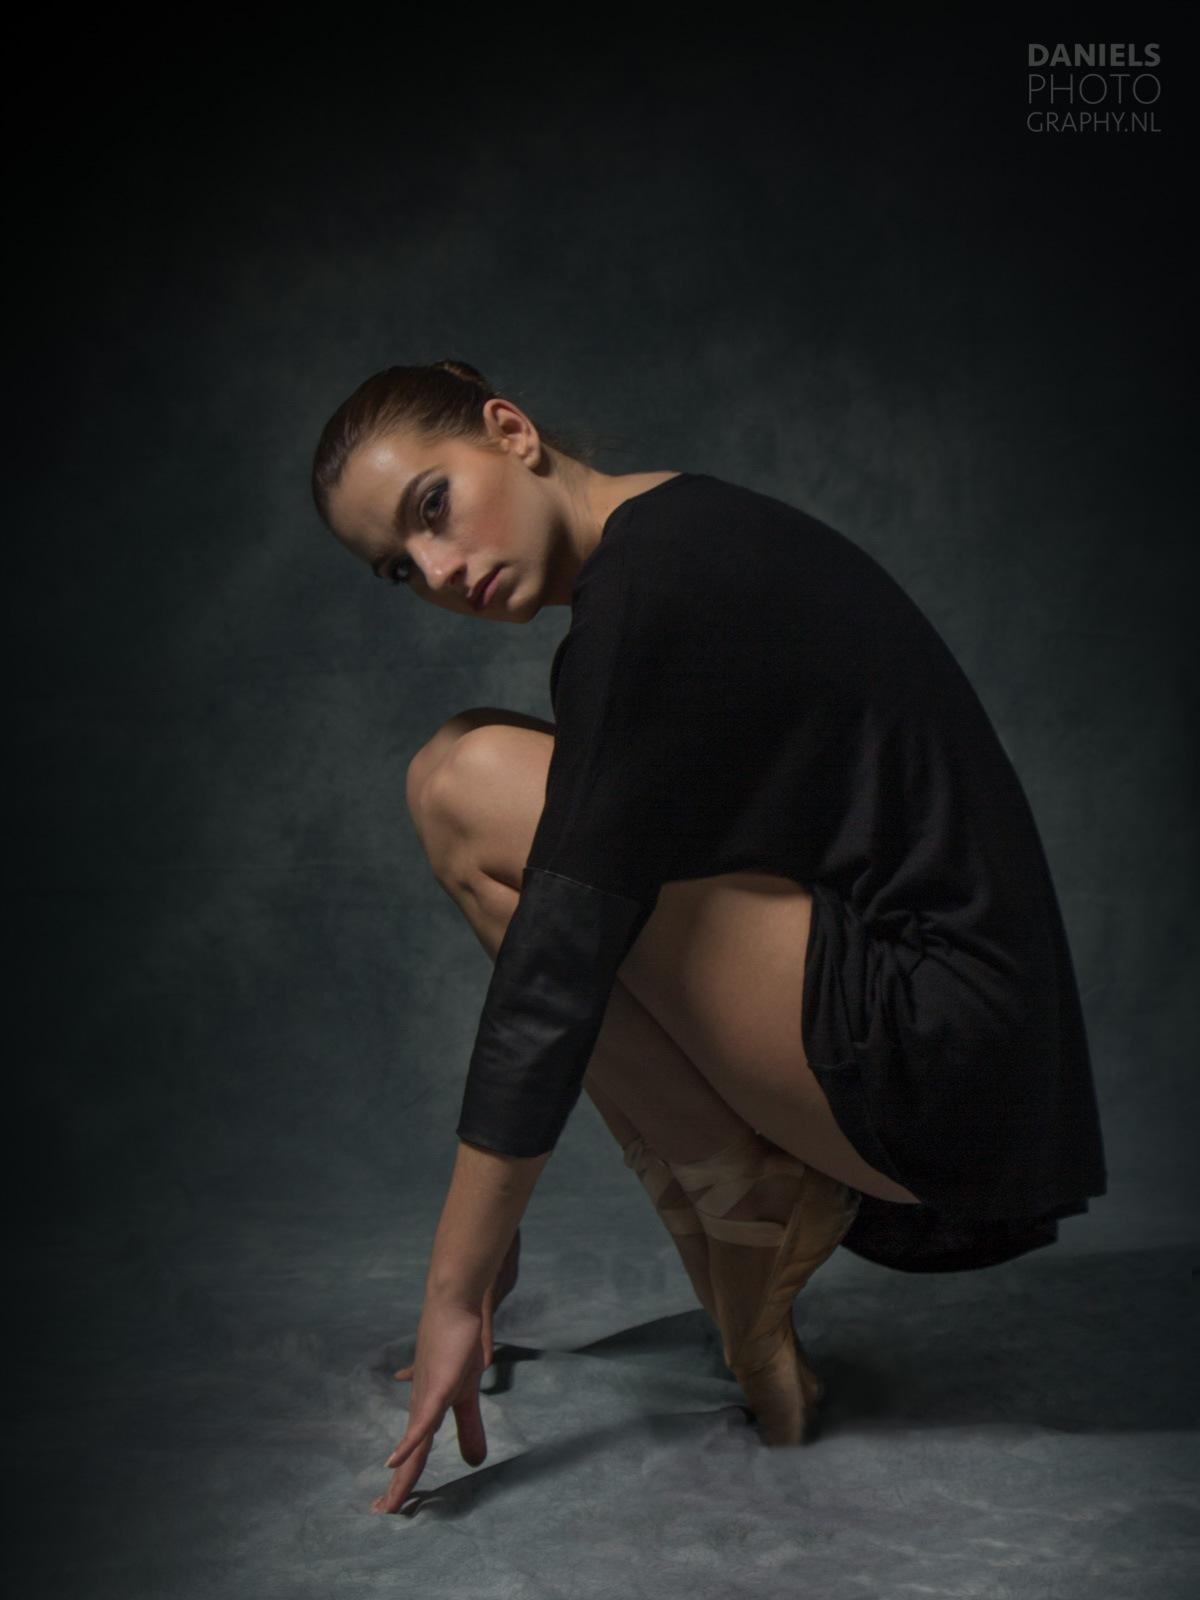 shoot of balletdanser Marielle by Gerard Daniels